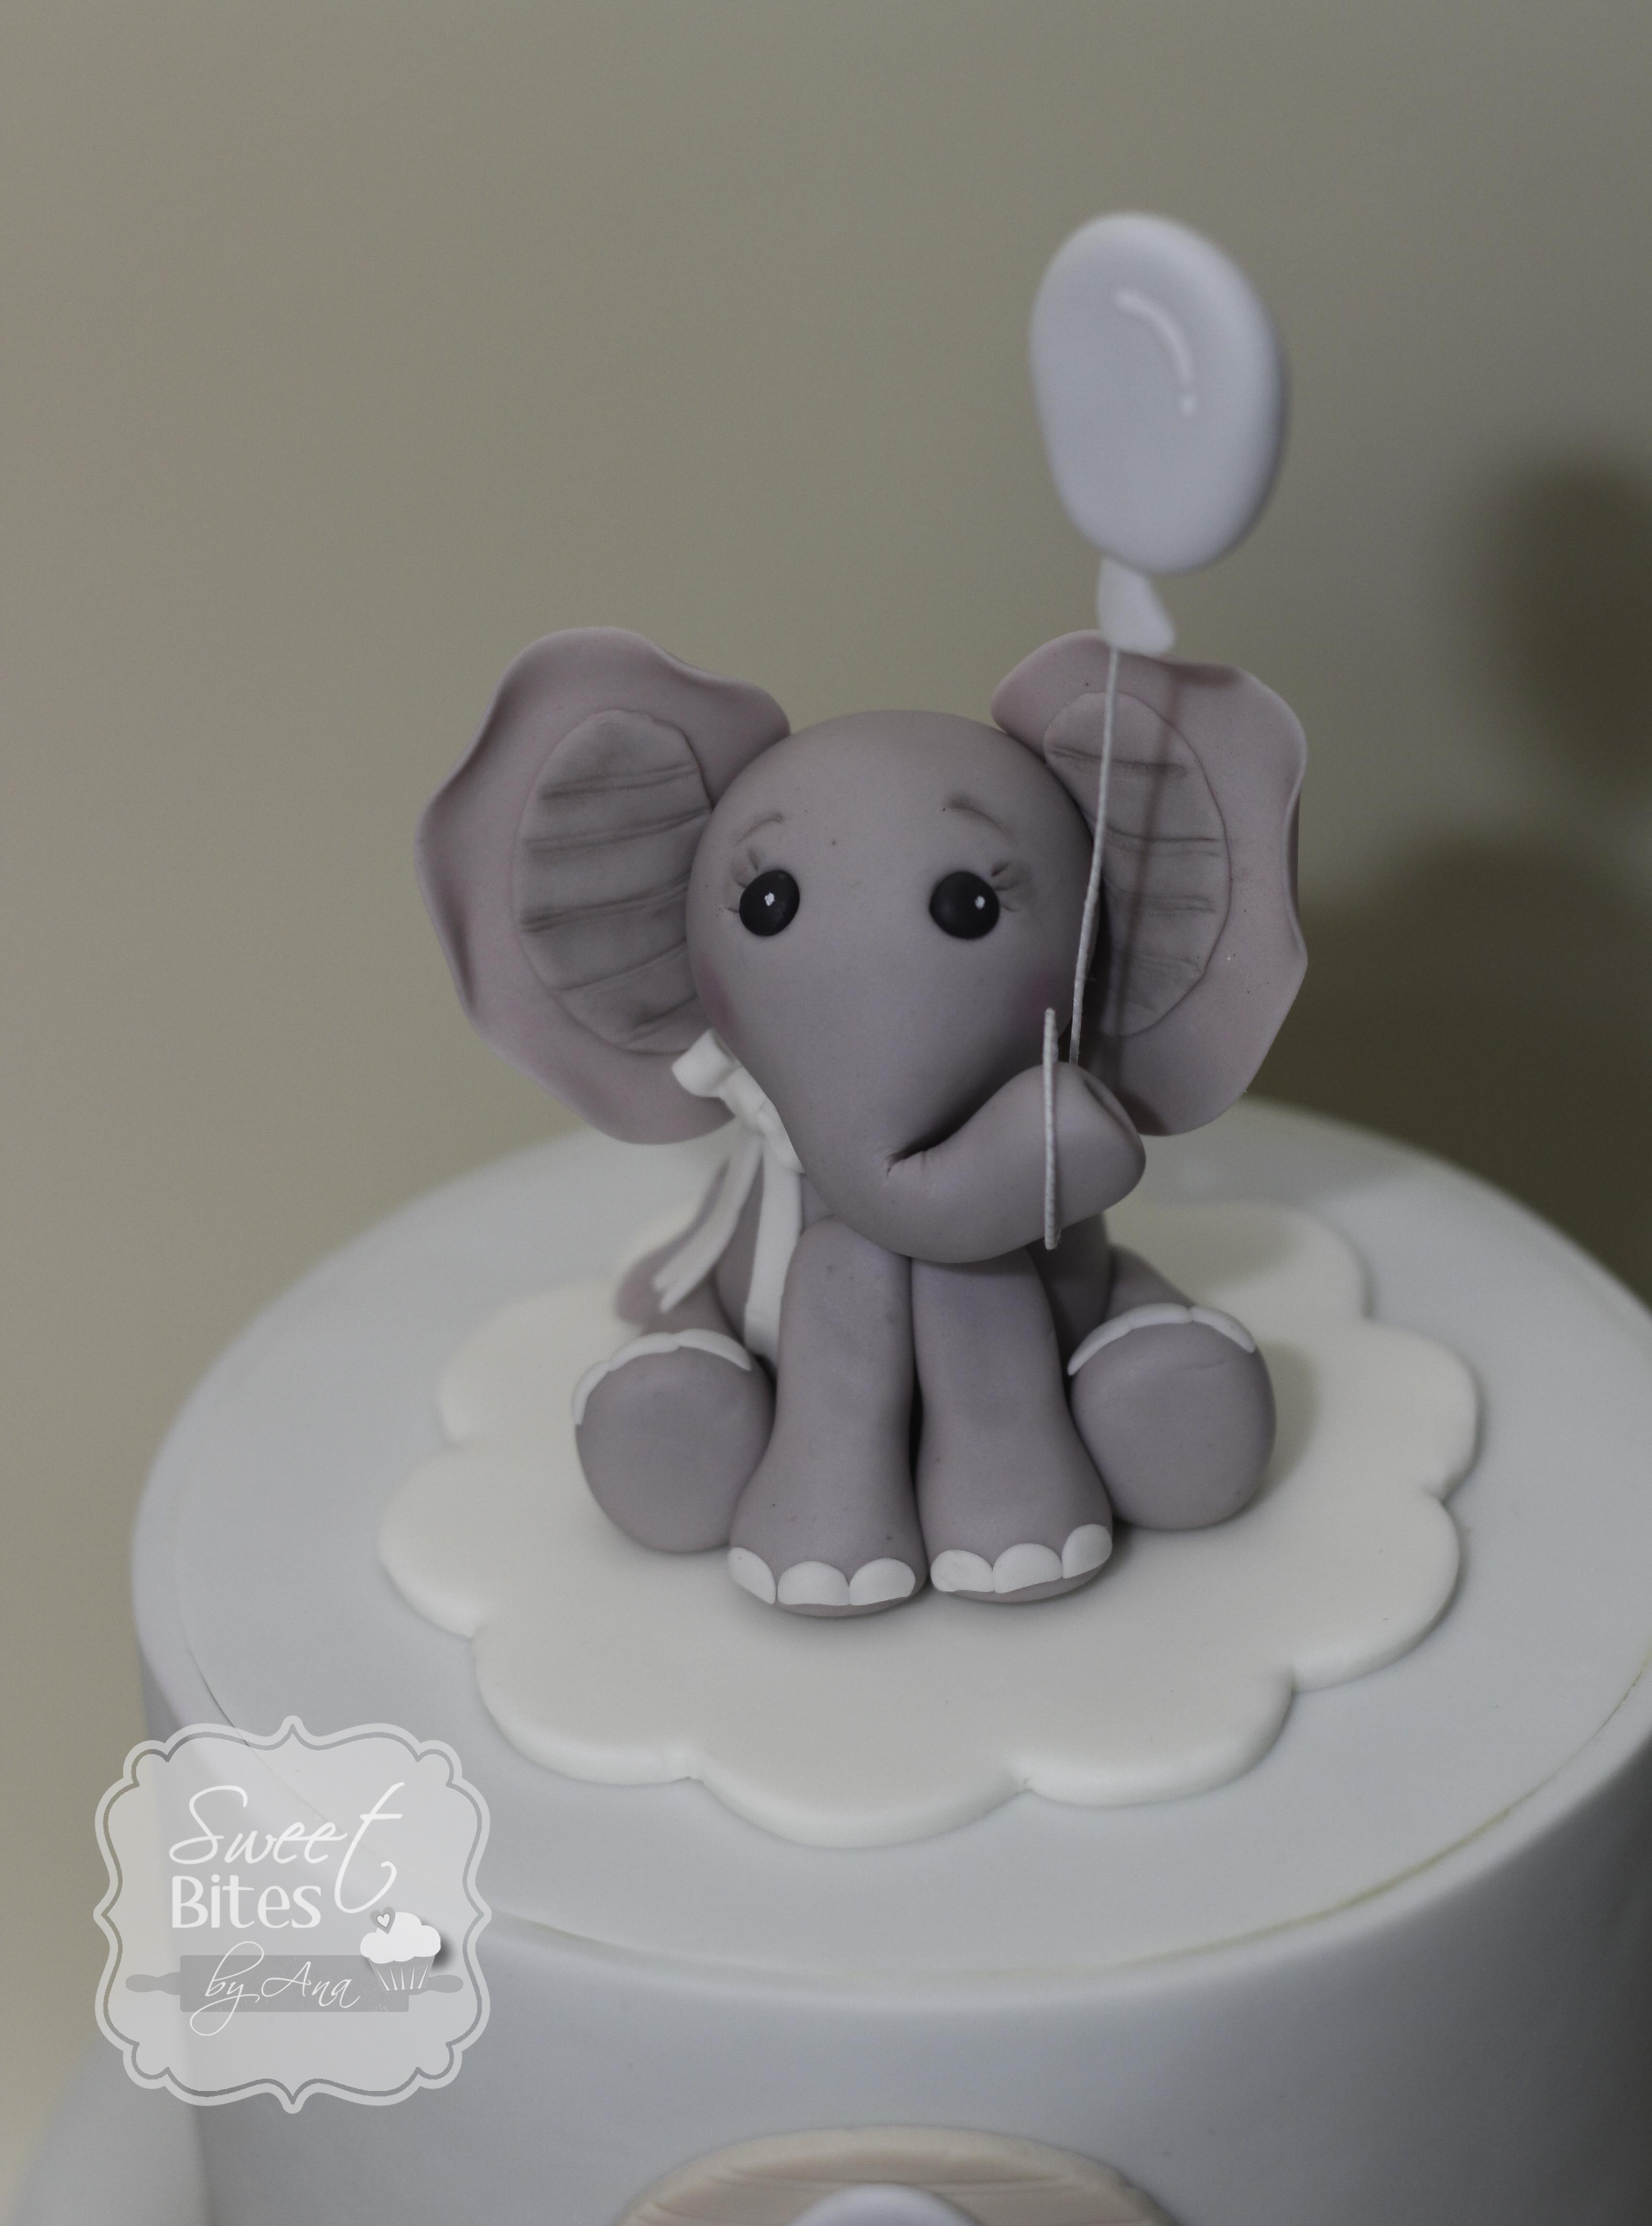 Animal Theme Boy Baby Shower Cake - CakeCentral.com